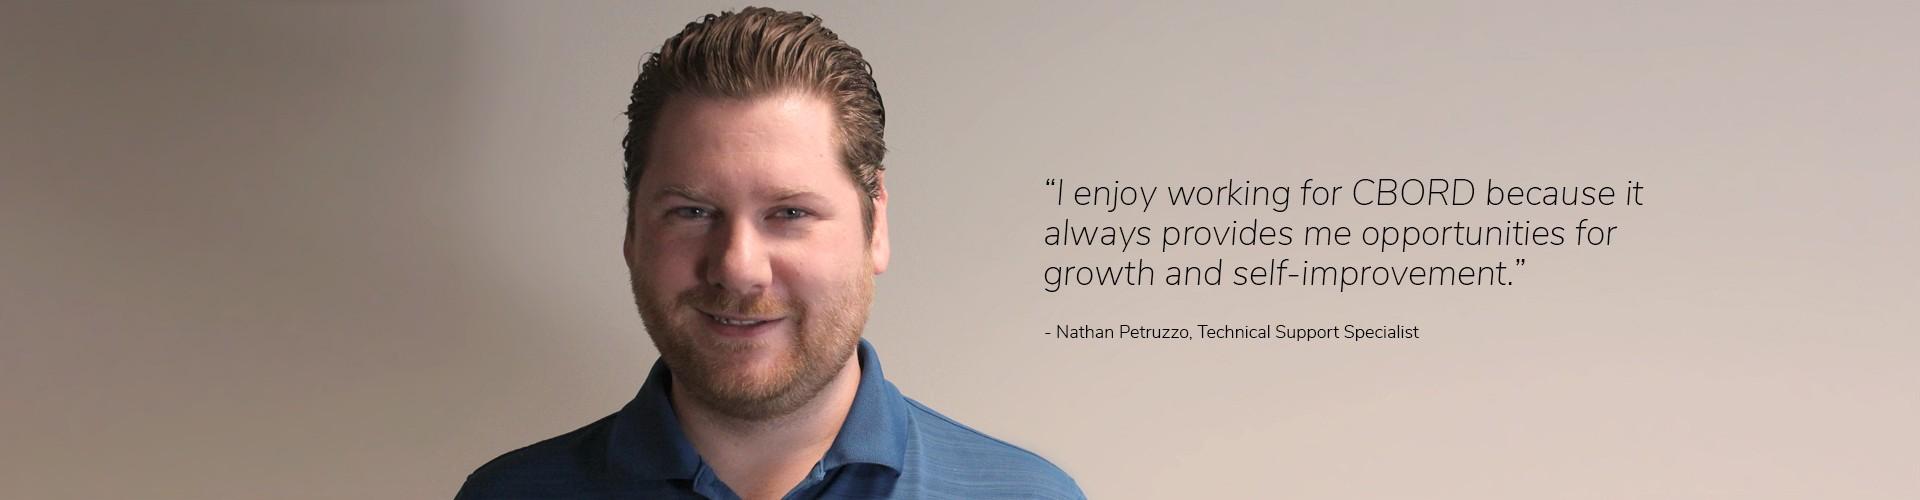 Nathan Petruzzo - Horizon Software Testimonial